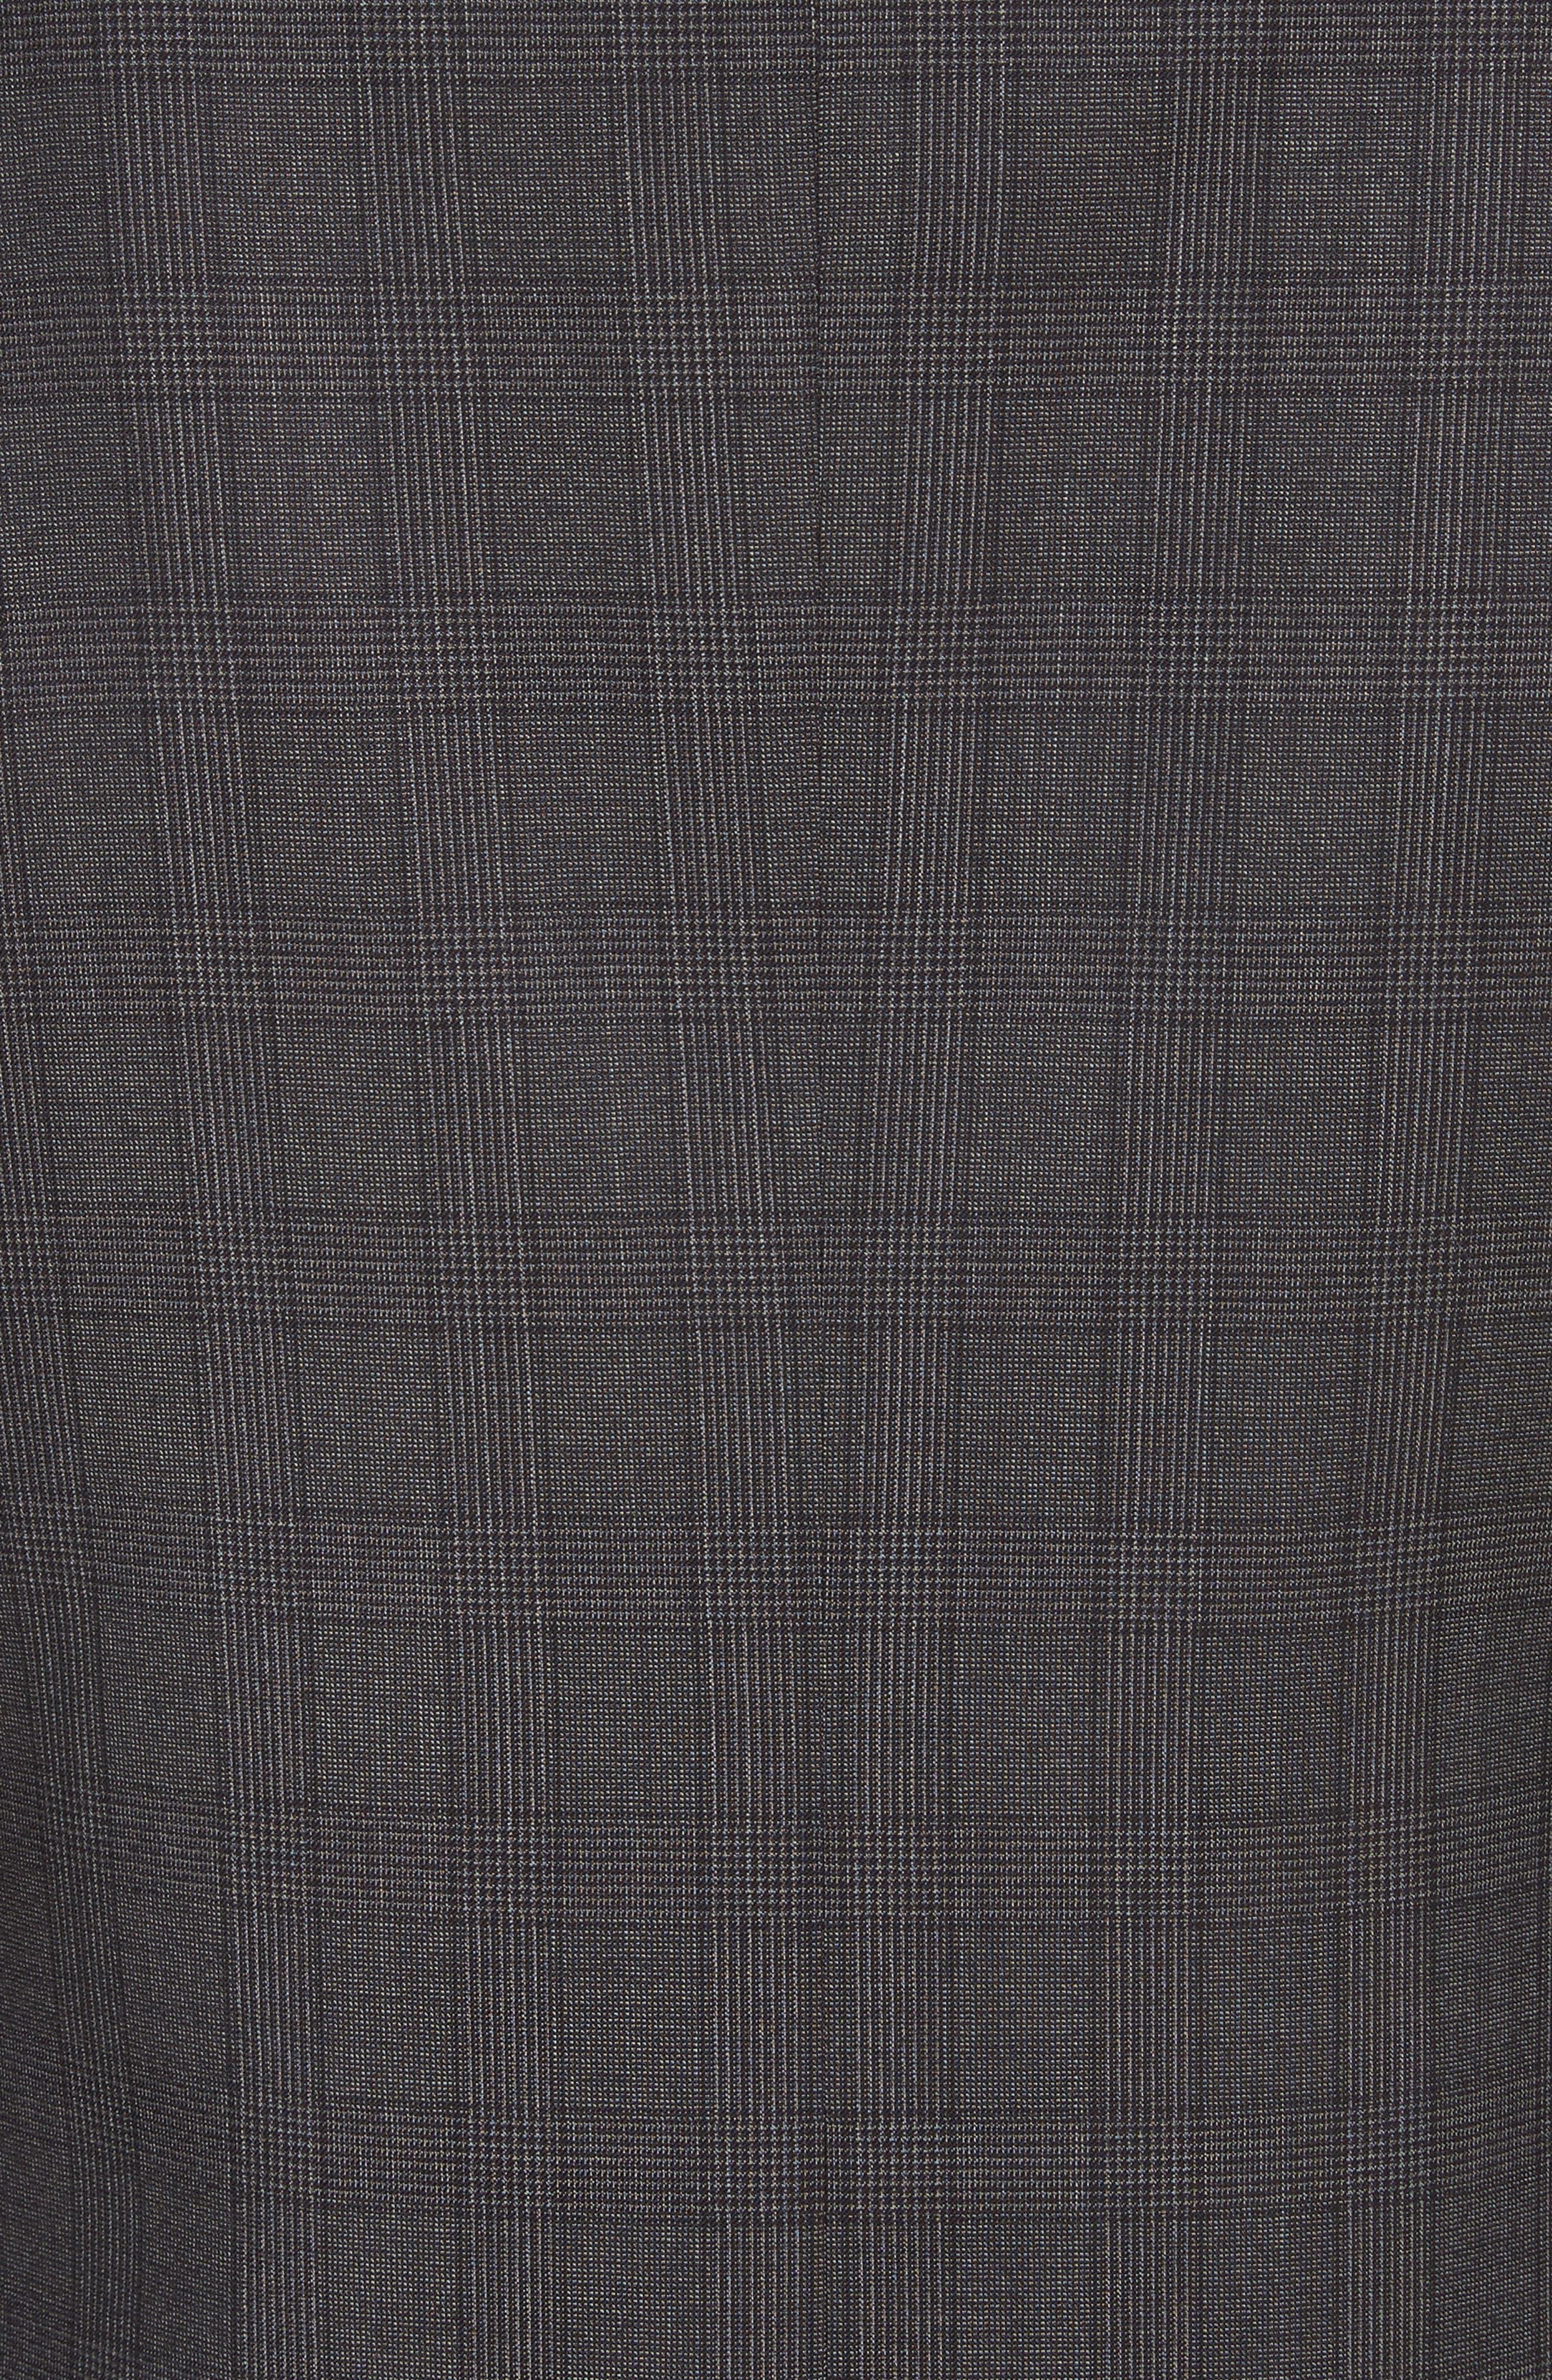 Classic Fit Plaid Wool Suit,                             Alternate thumbnail 7, color,                             Brown